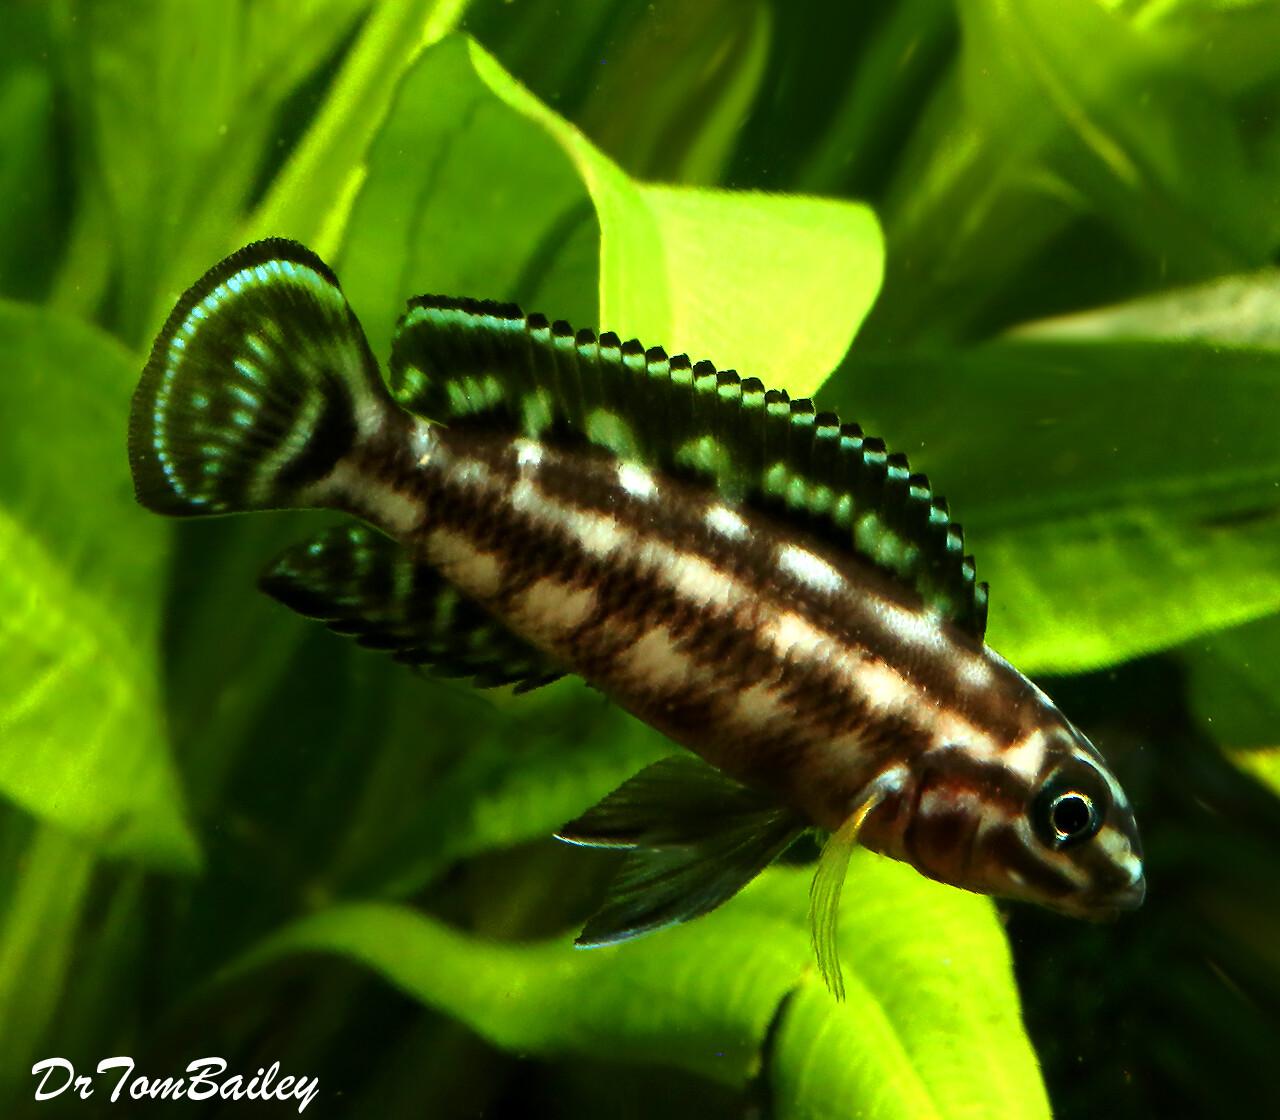 Premium Lake Tanganyika Plaid Juli Cichlid, Julidochromis marlieri